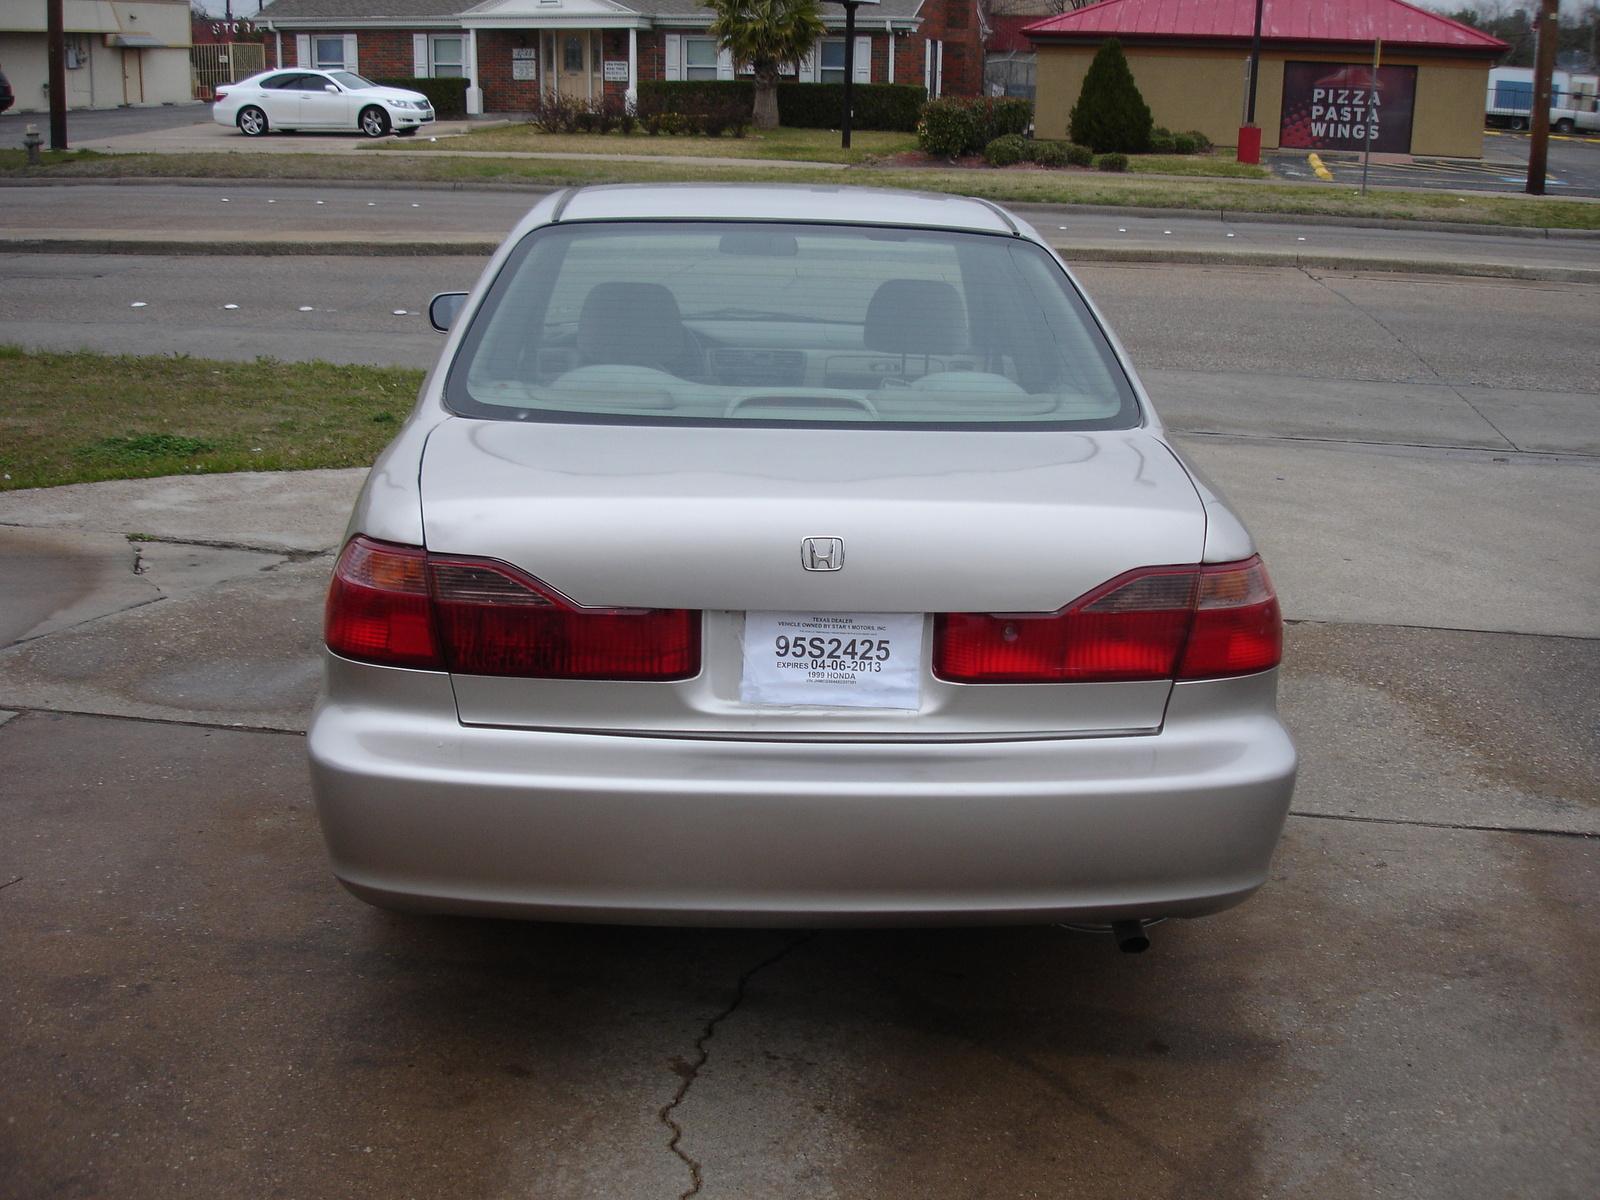 Honda accord used cars autos post for 2001 honda accord window problems